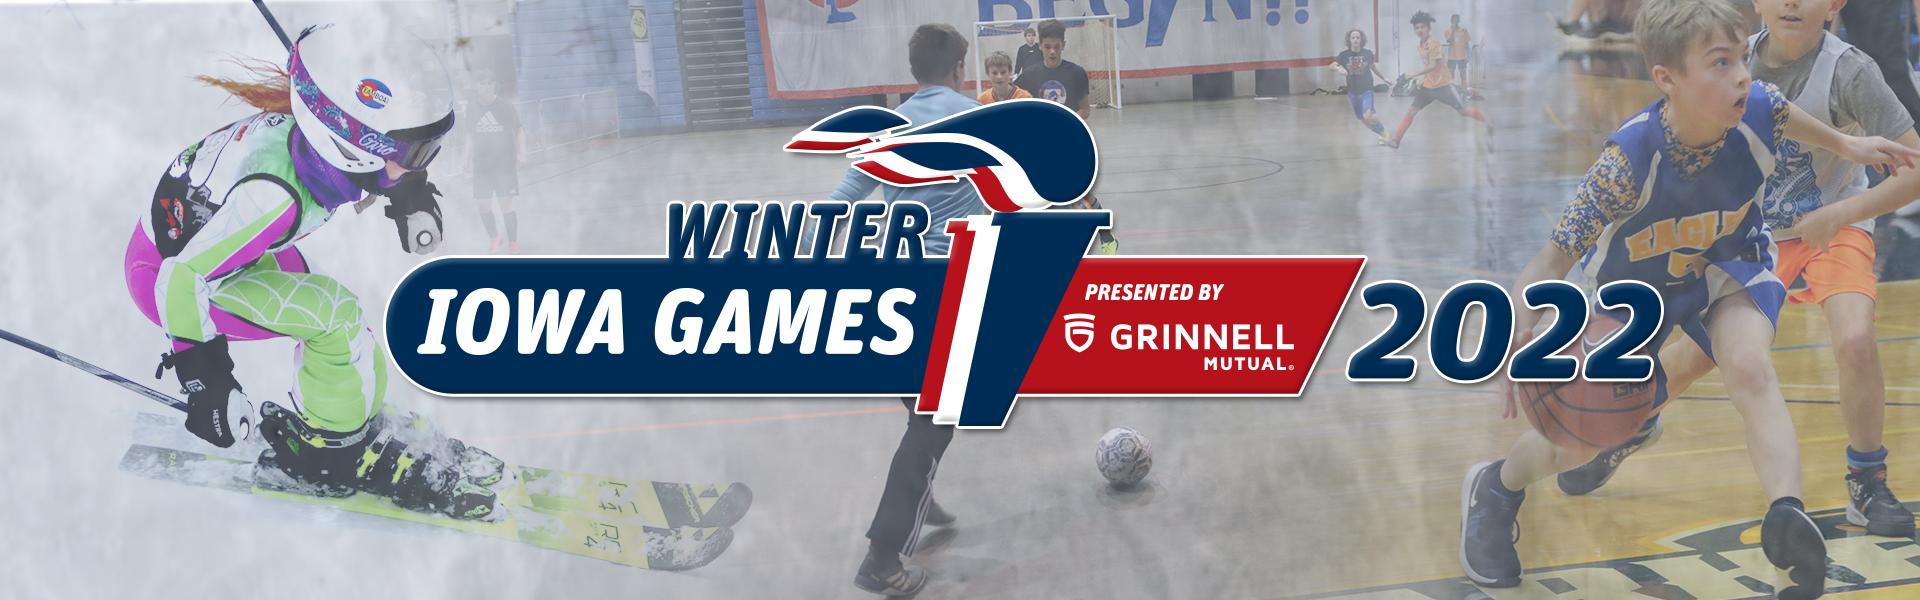 2022 Winter Iowa Games